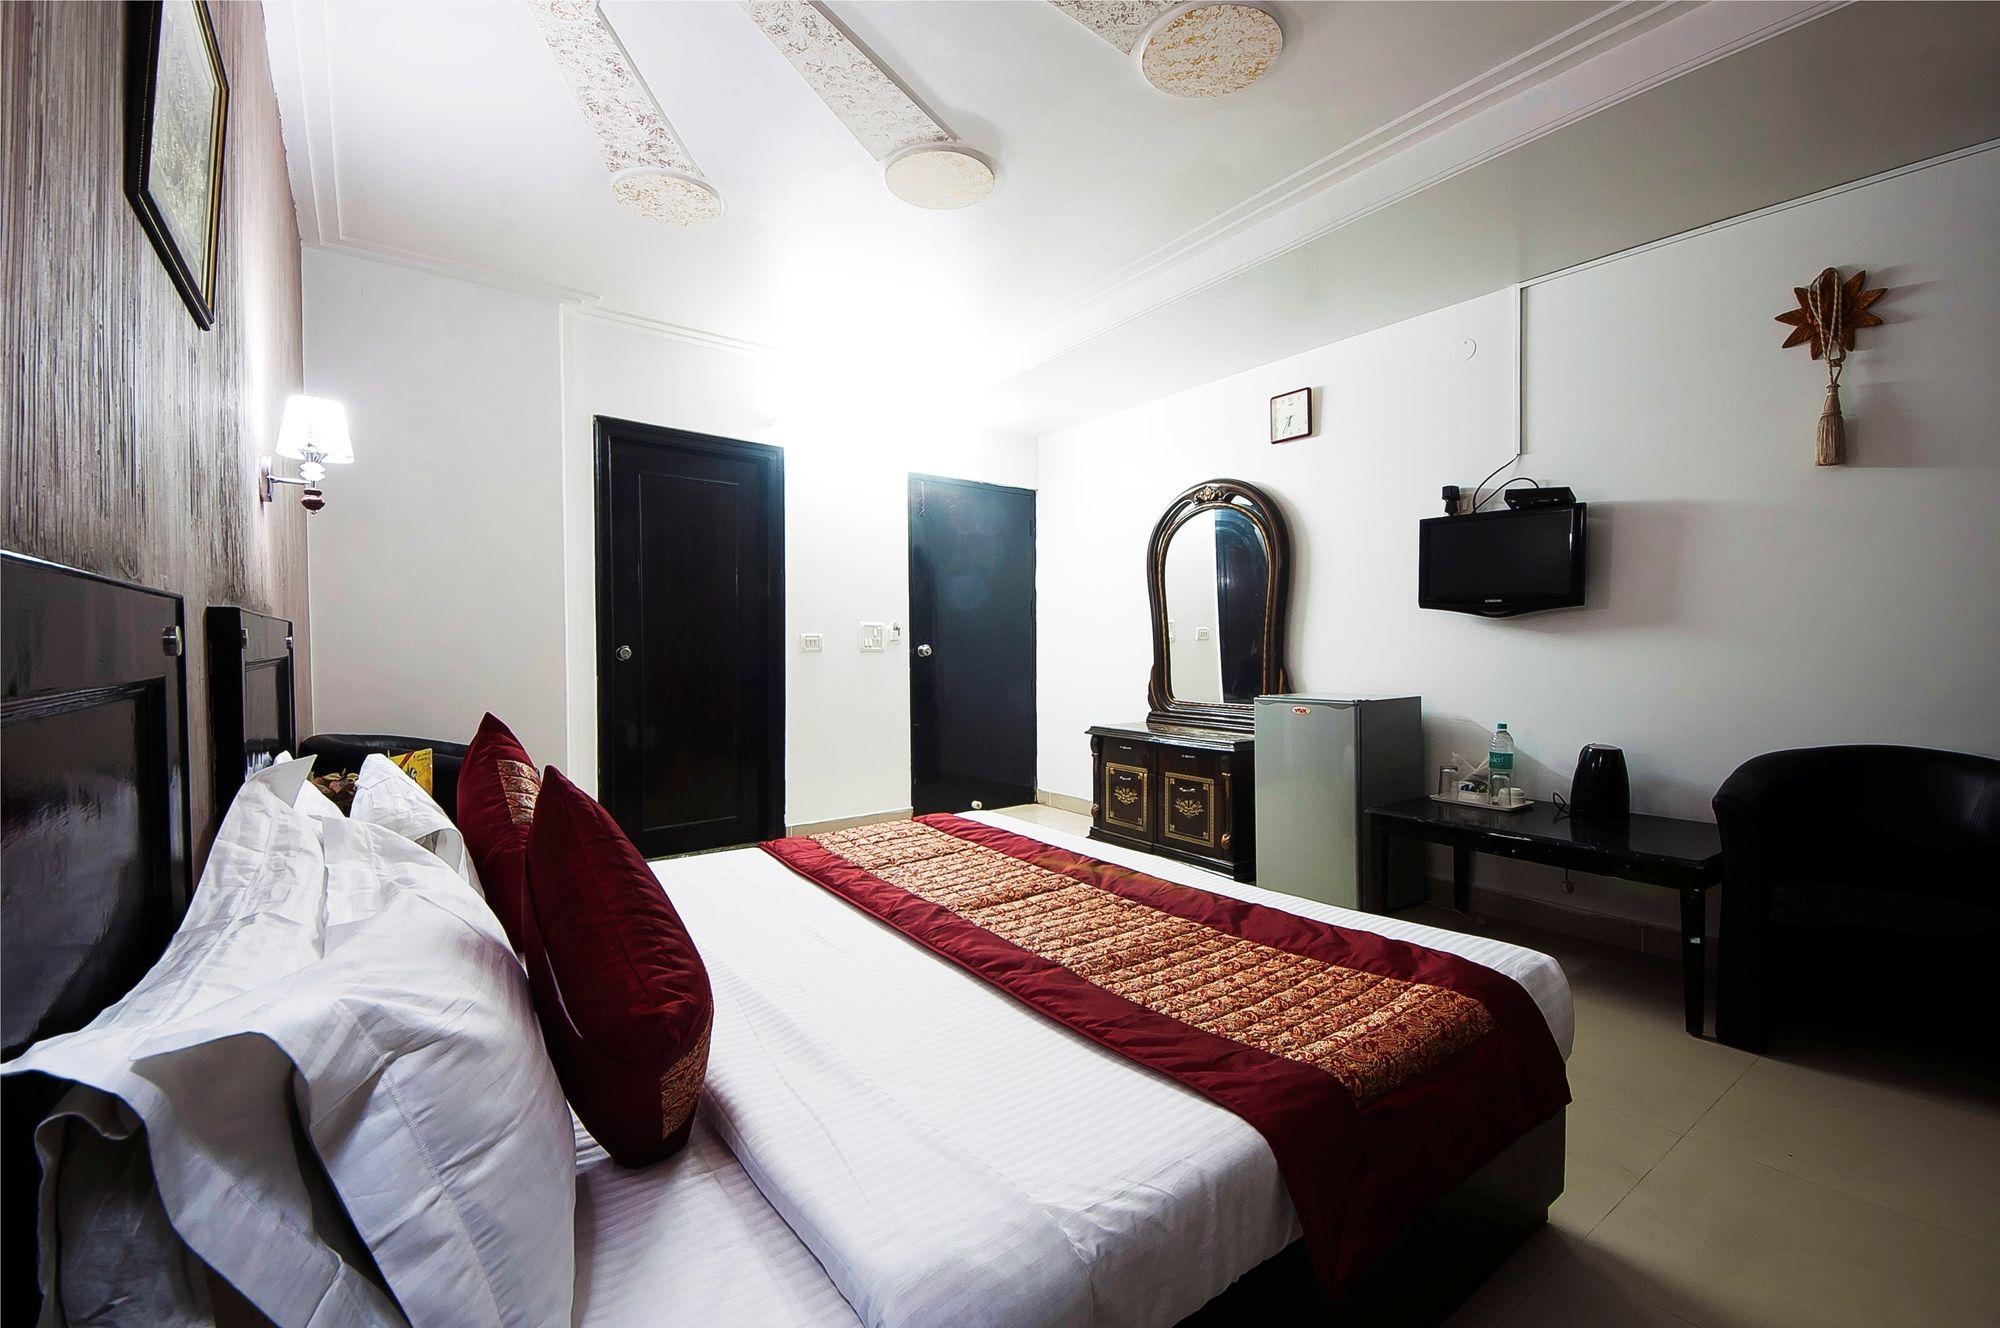 Airport Hotel Noratan Palace